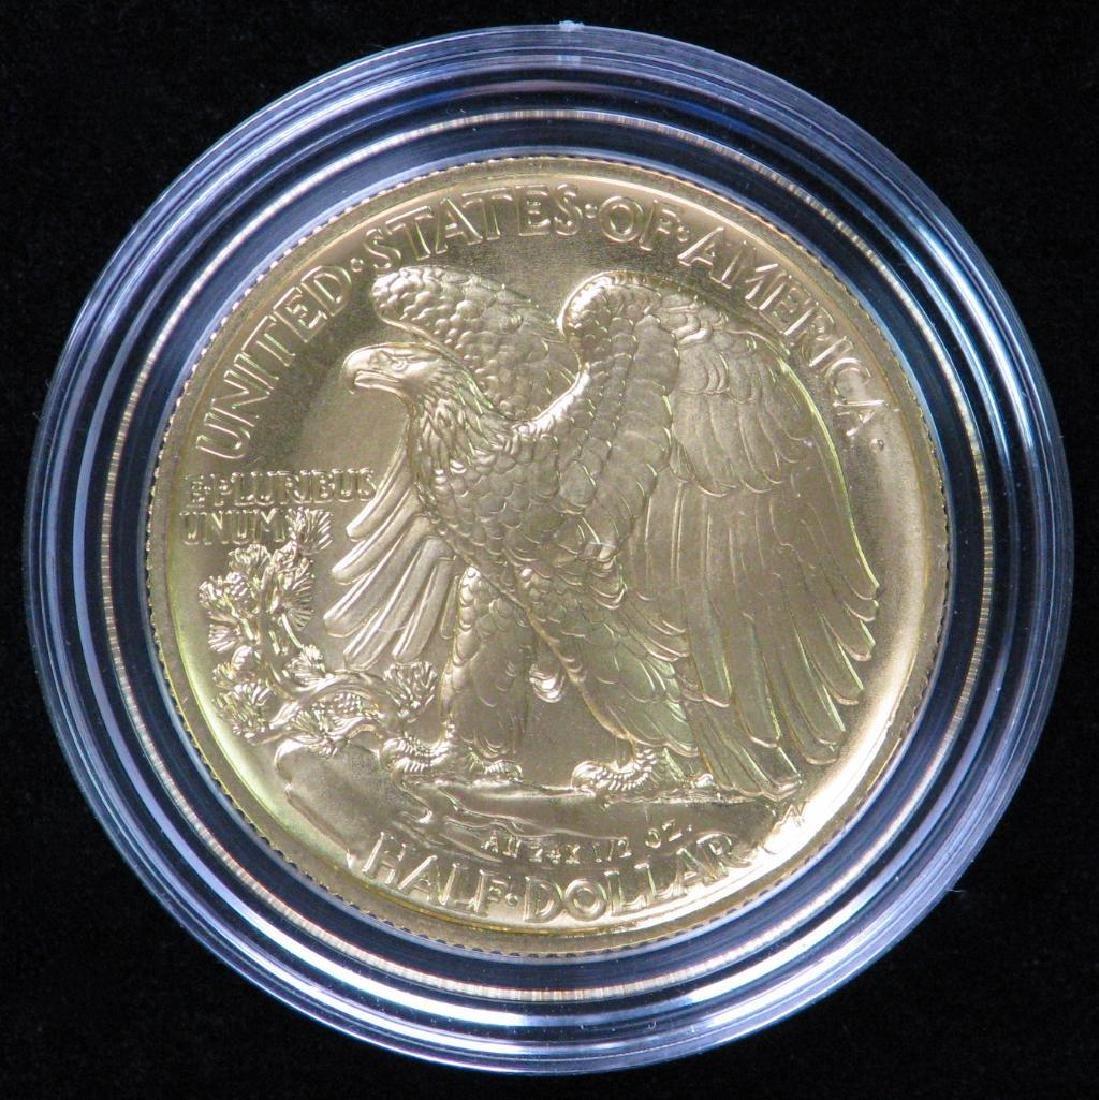 2016-W Walking Liberty Half Dollar Centennial Gold Coin - 2